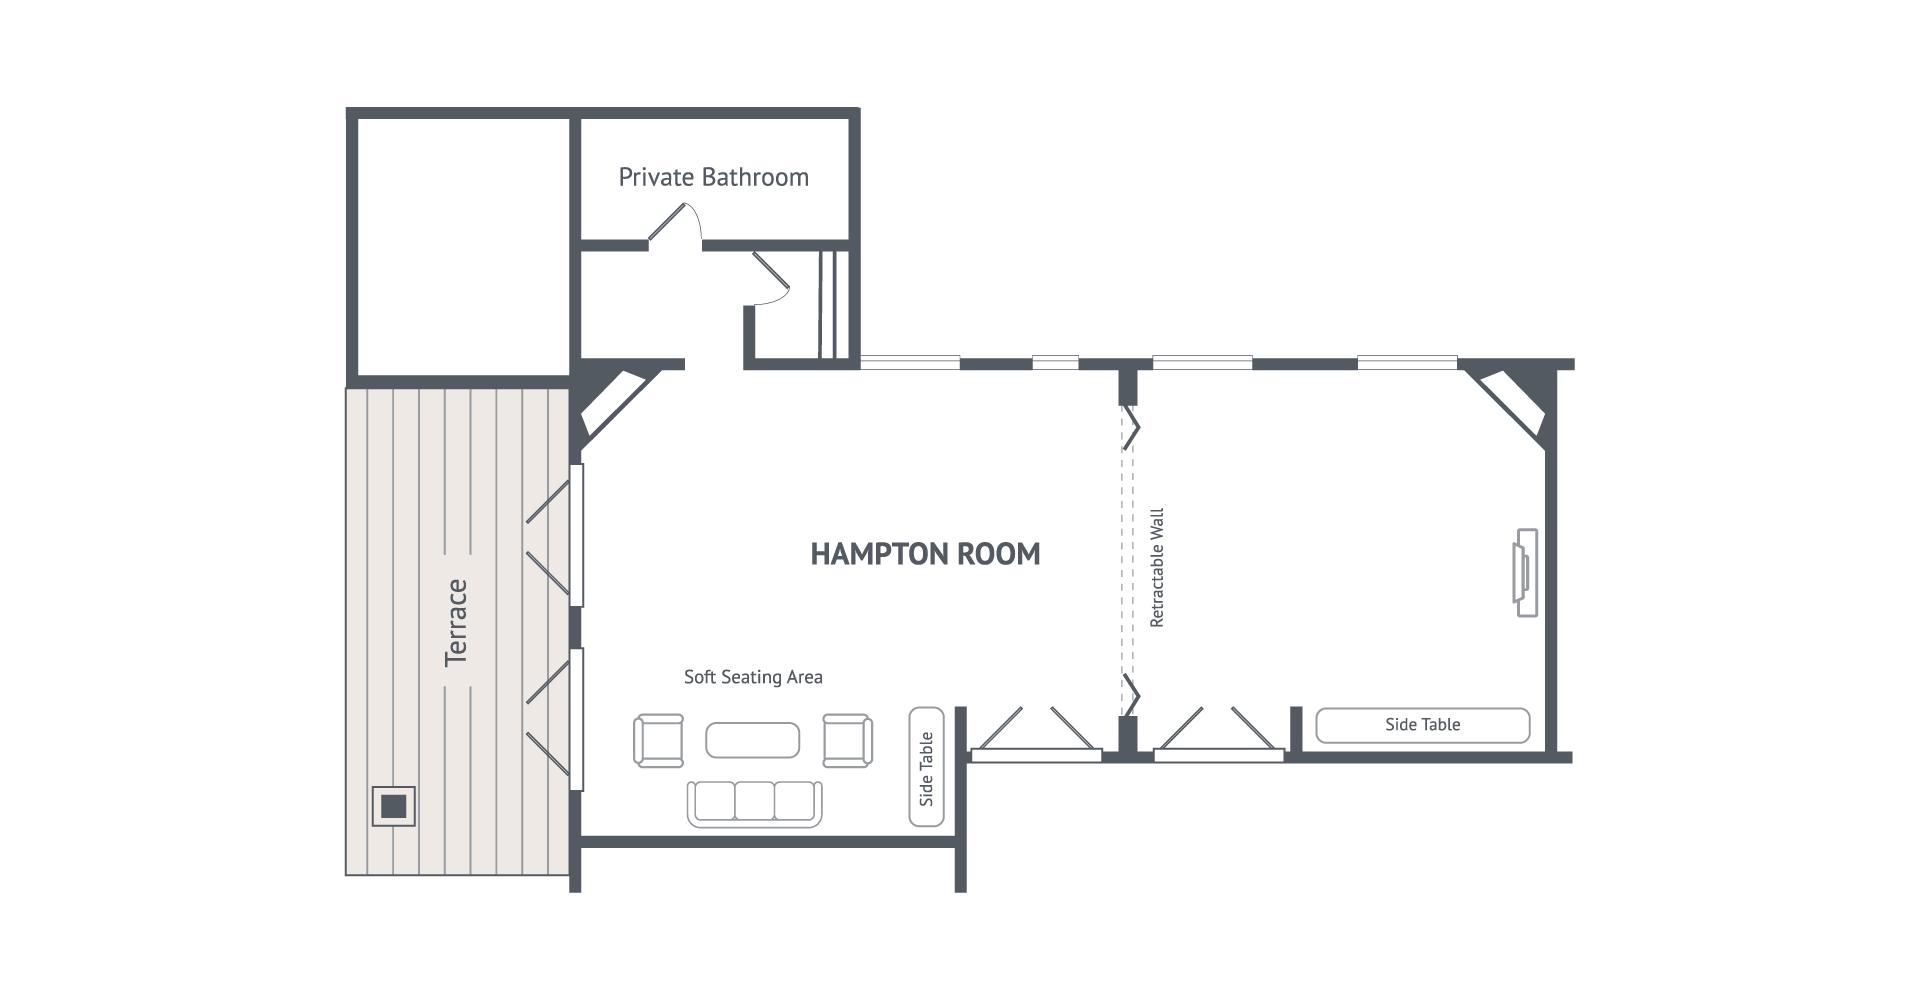 hight resolution of hampton room diagram